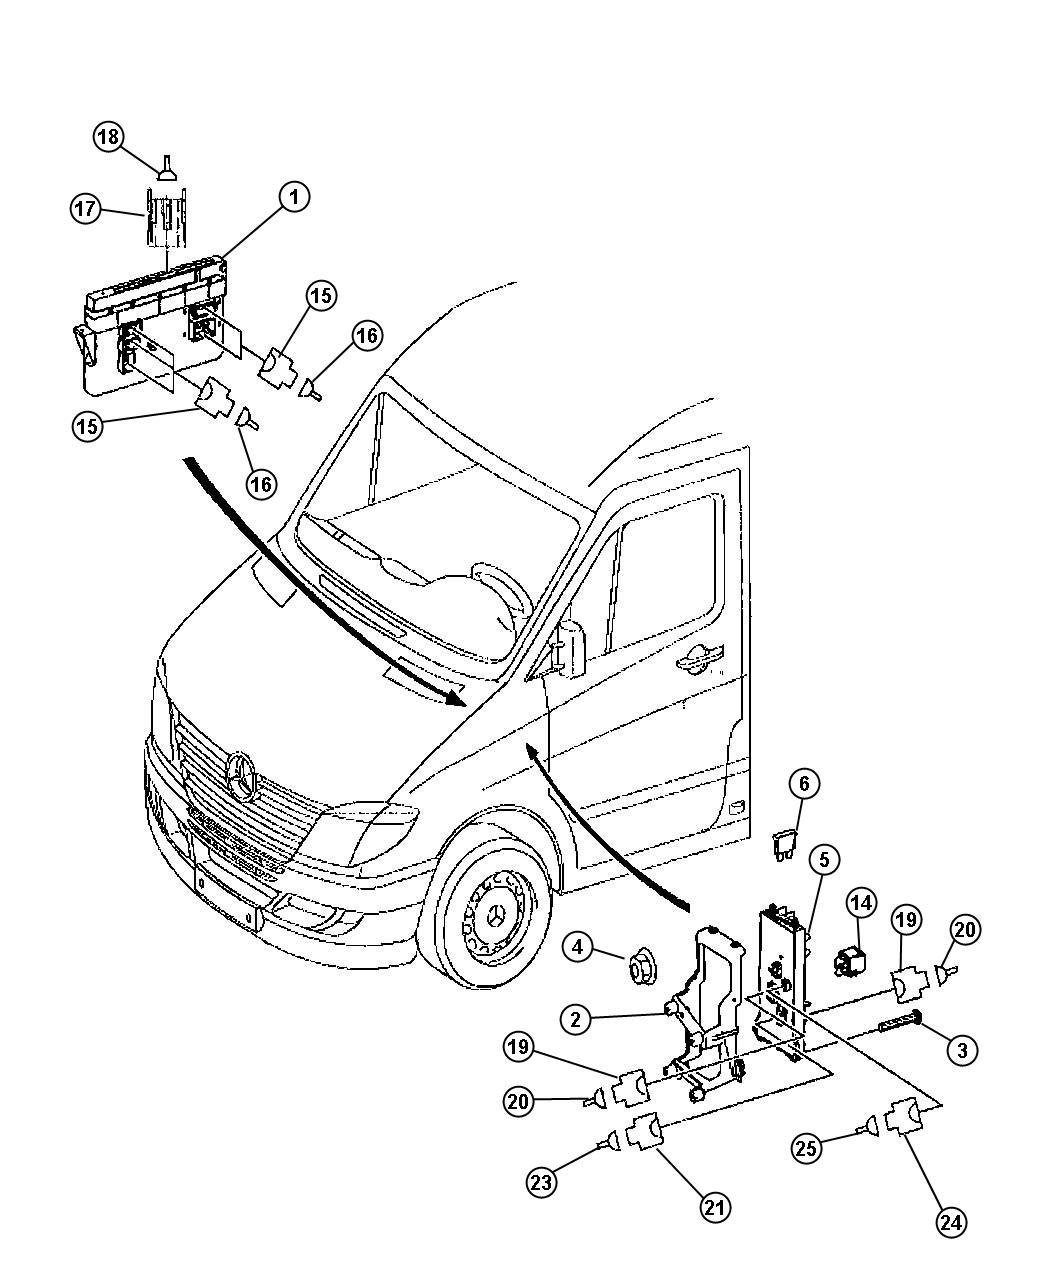 hight resolution of dodge 2500 sprinter fuse box location dodge auto wiring 1997 dodge ram 1500 interior fuse box